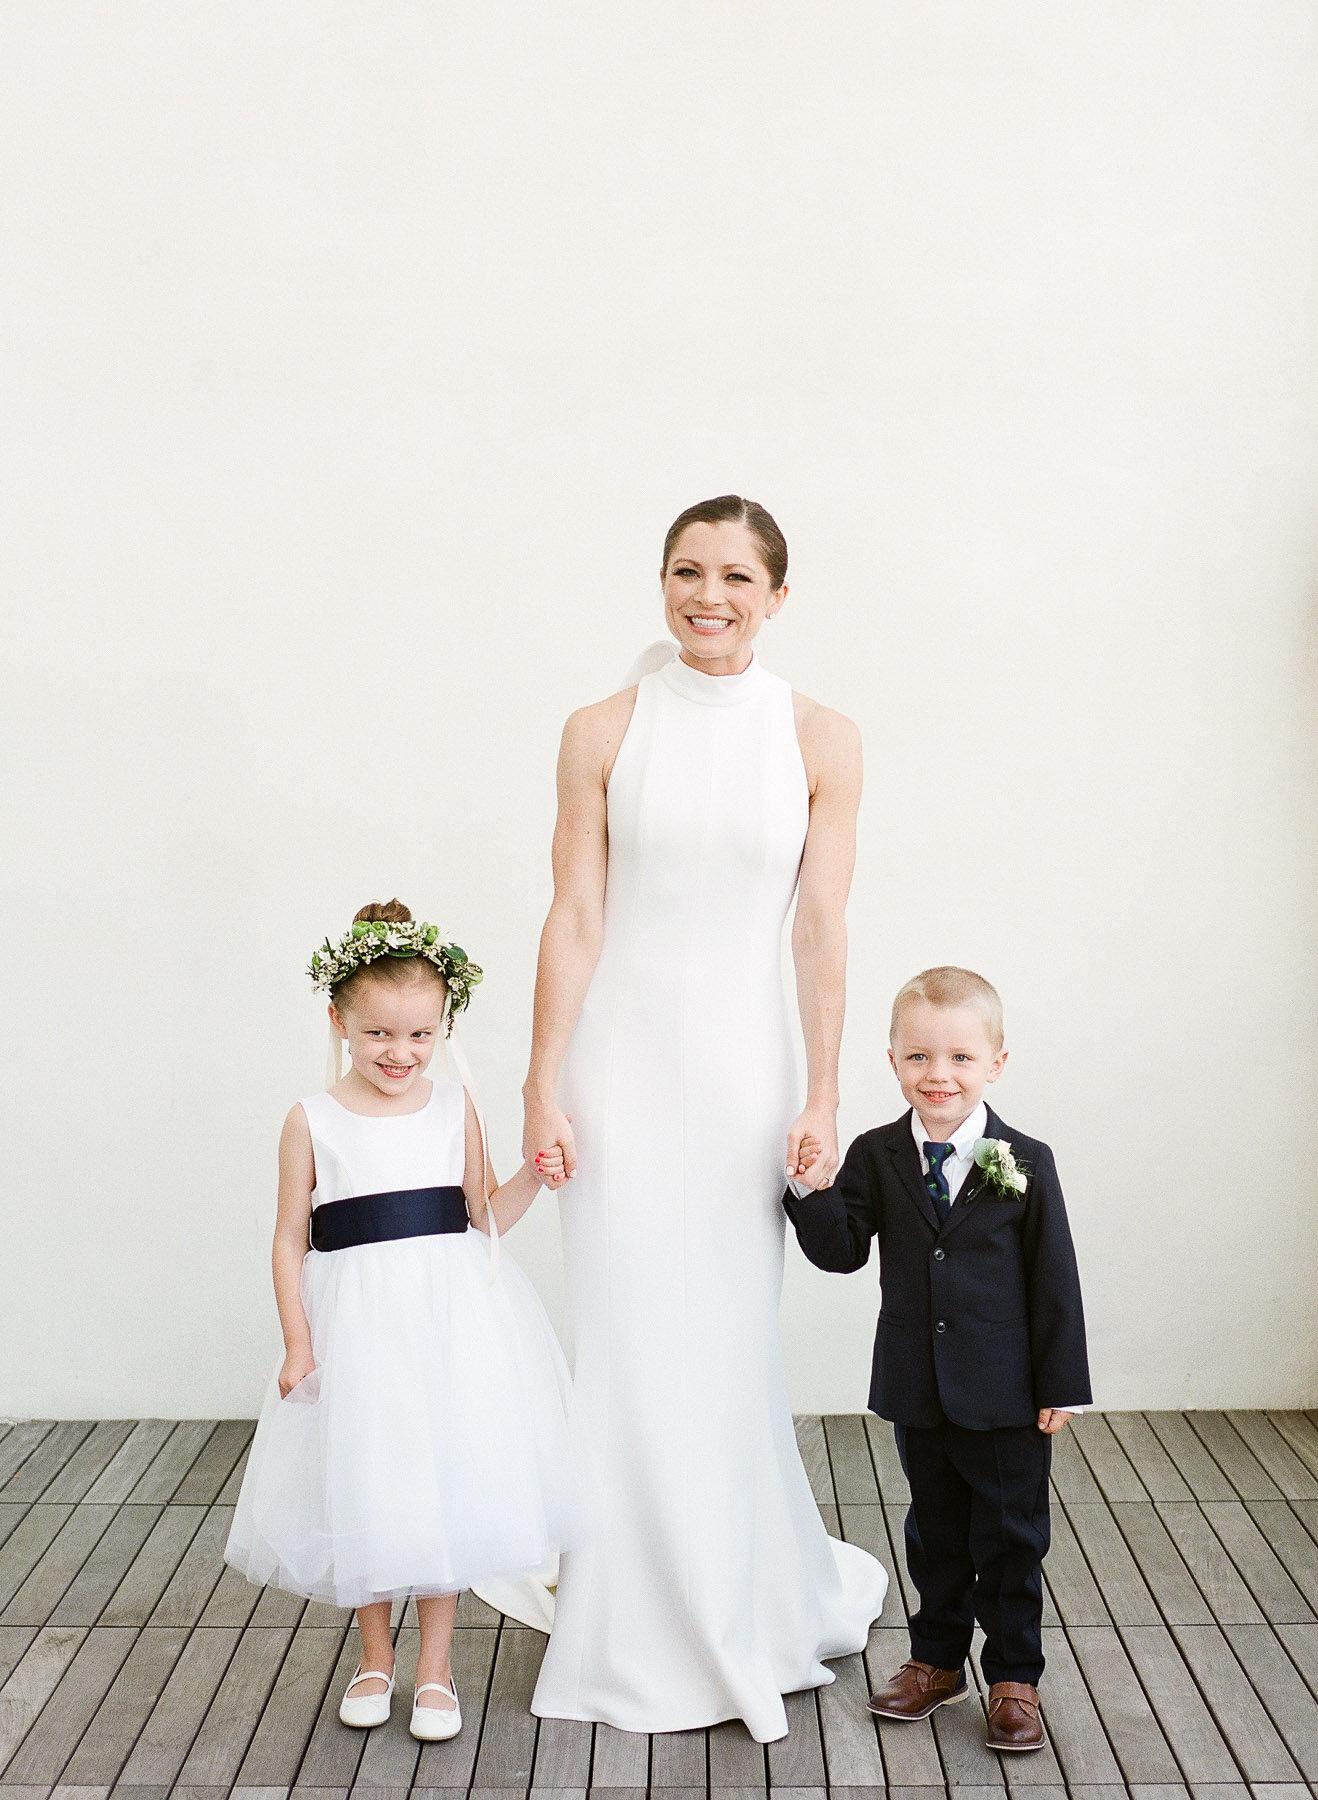 Adelphi Saratoga Wedding by Michelle Lange Photography-64.jpg